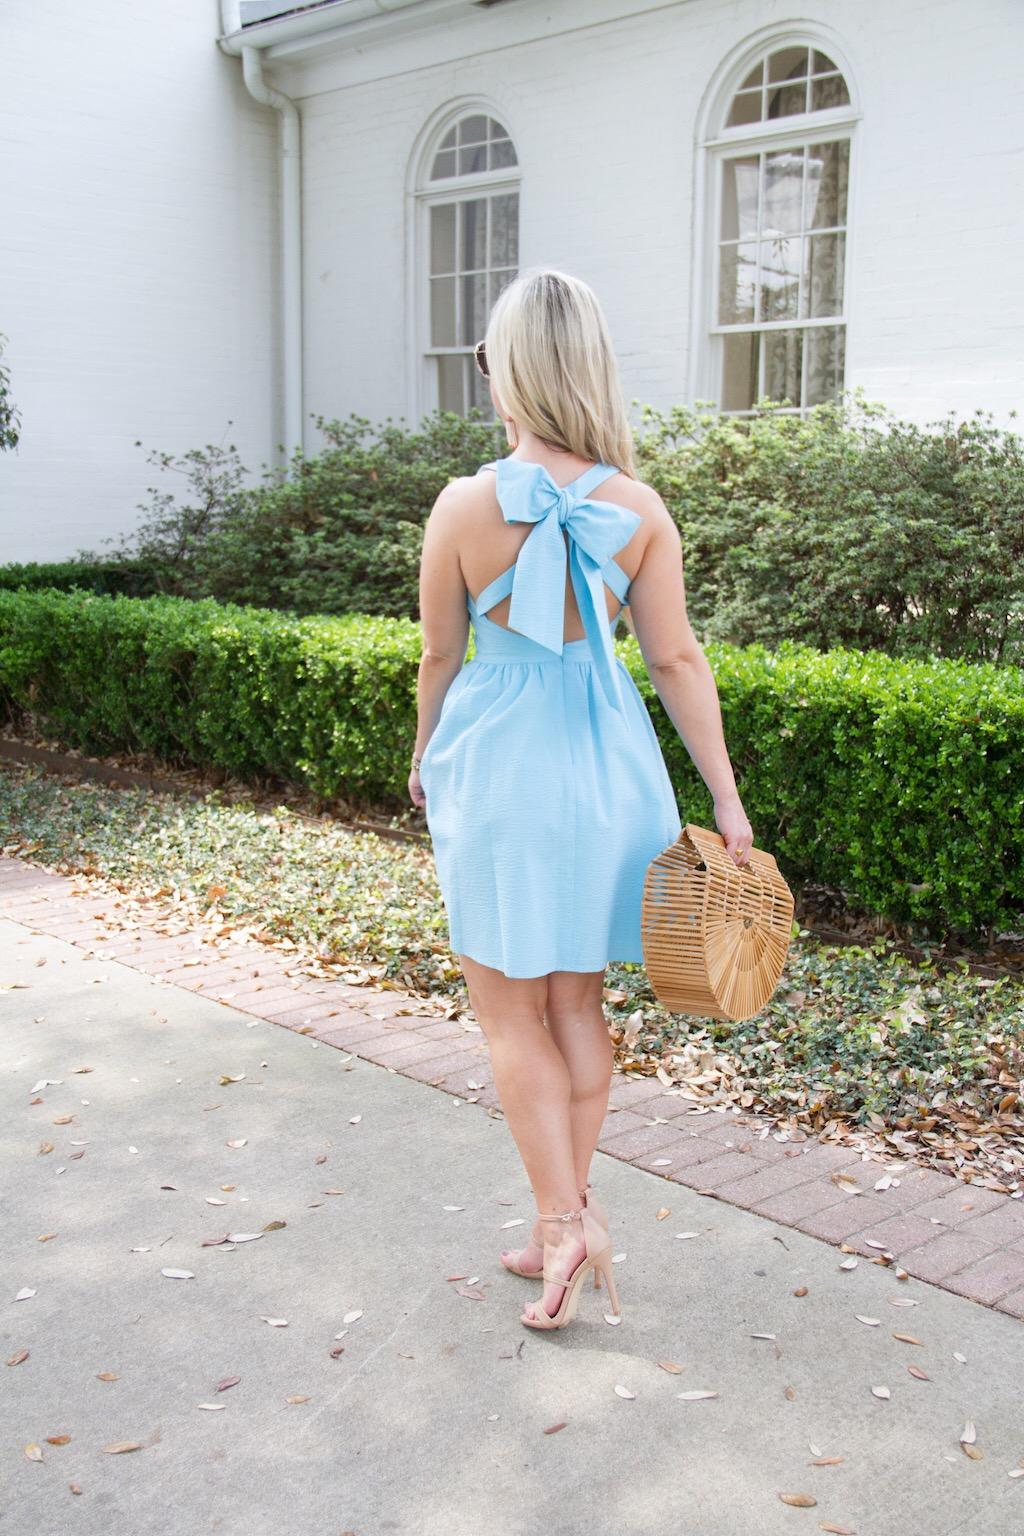 Easter Dress | The Darling Petite Diva